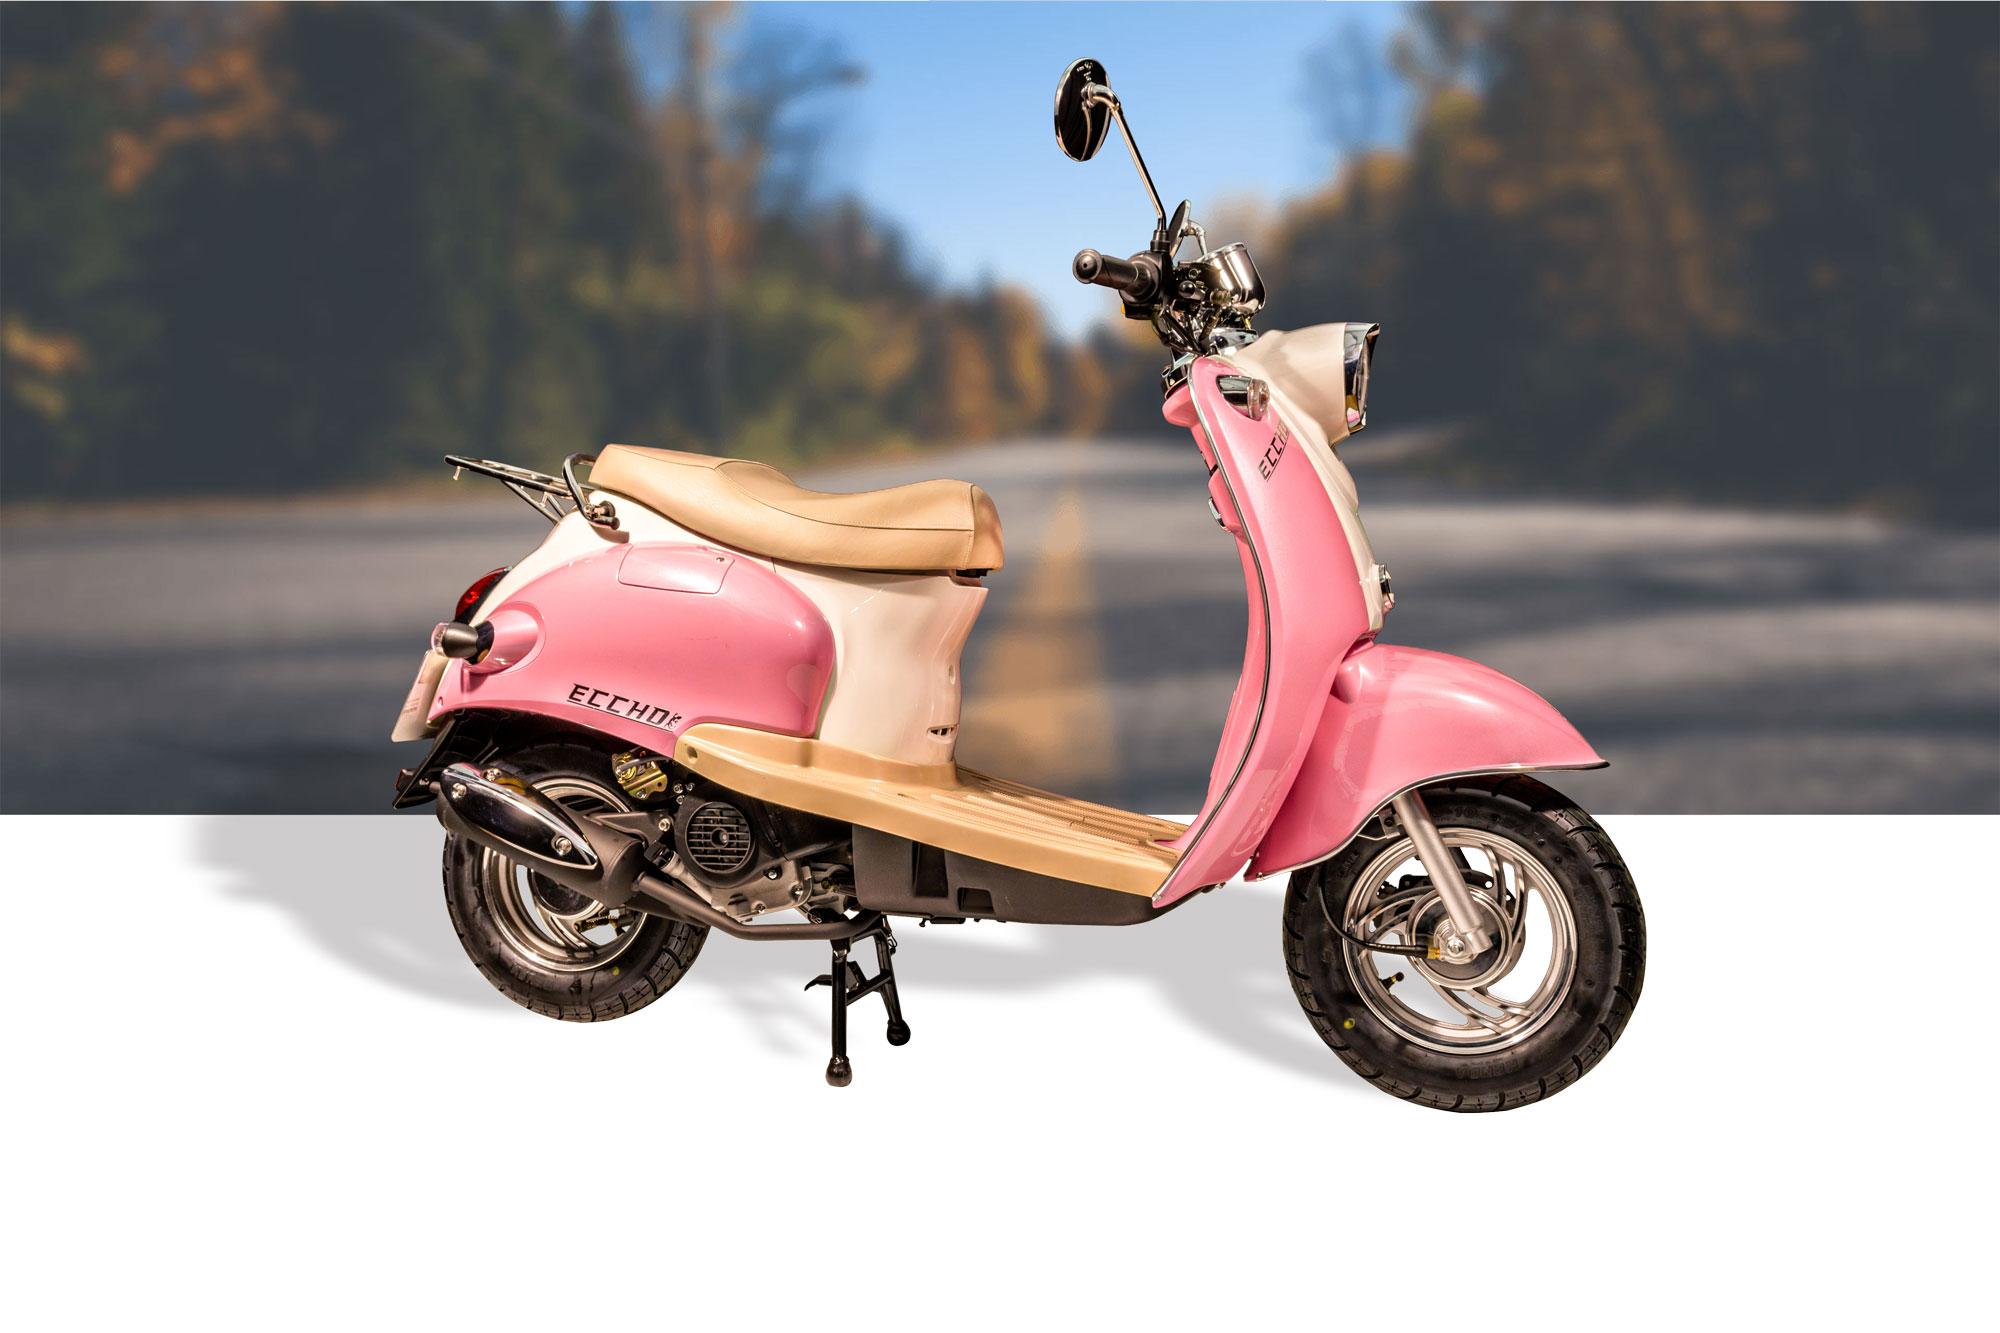 scooter ty50qt k pink scooters eccho cholet acheter un. Black Bedroom Furniture Sets. Home Design Ideas